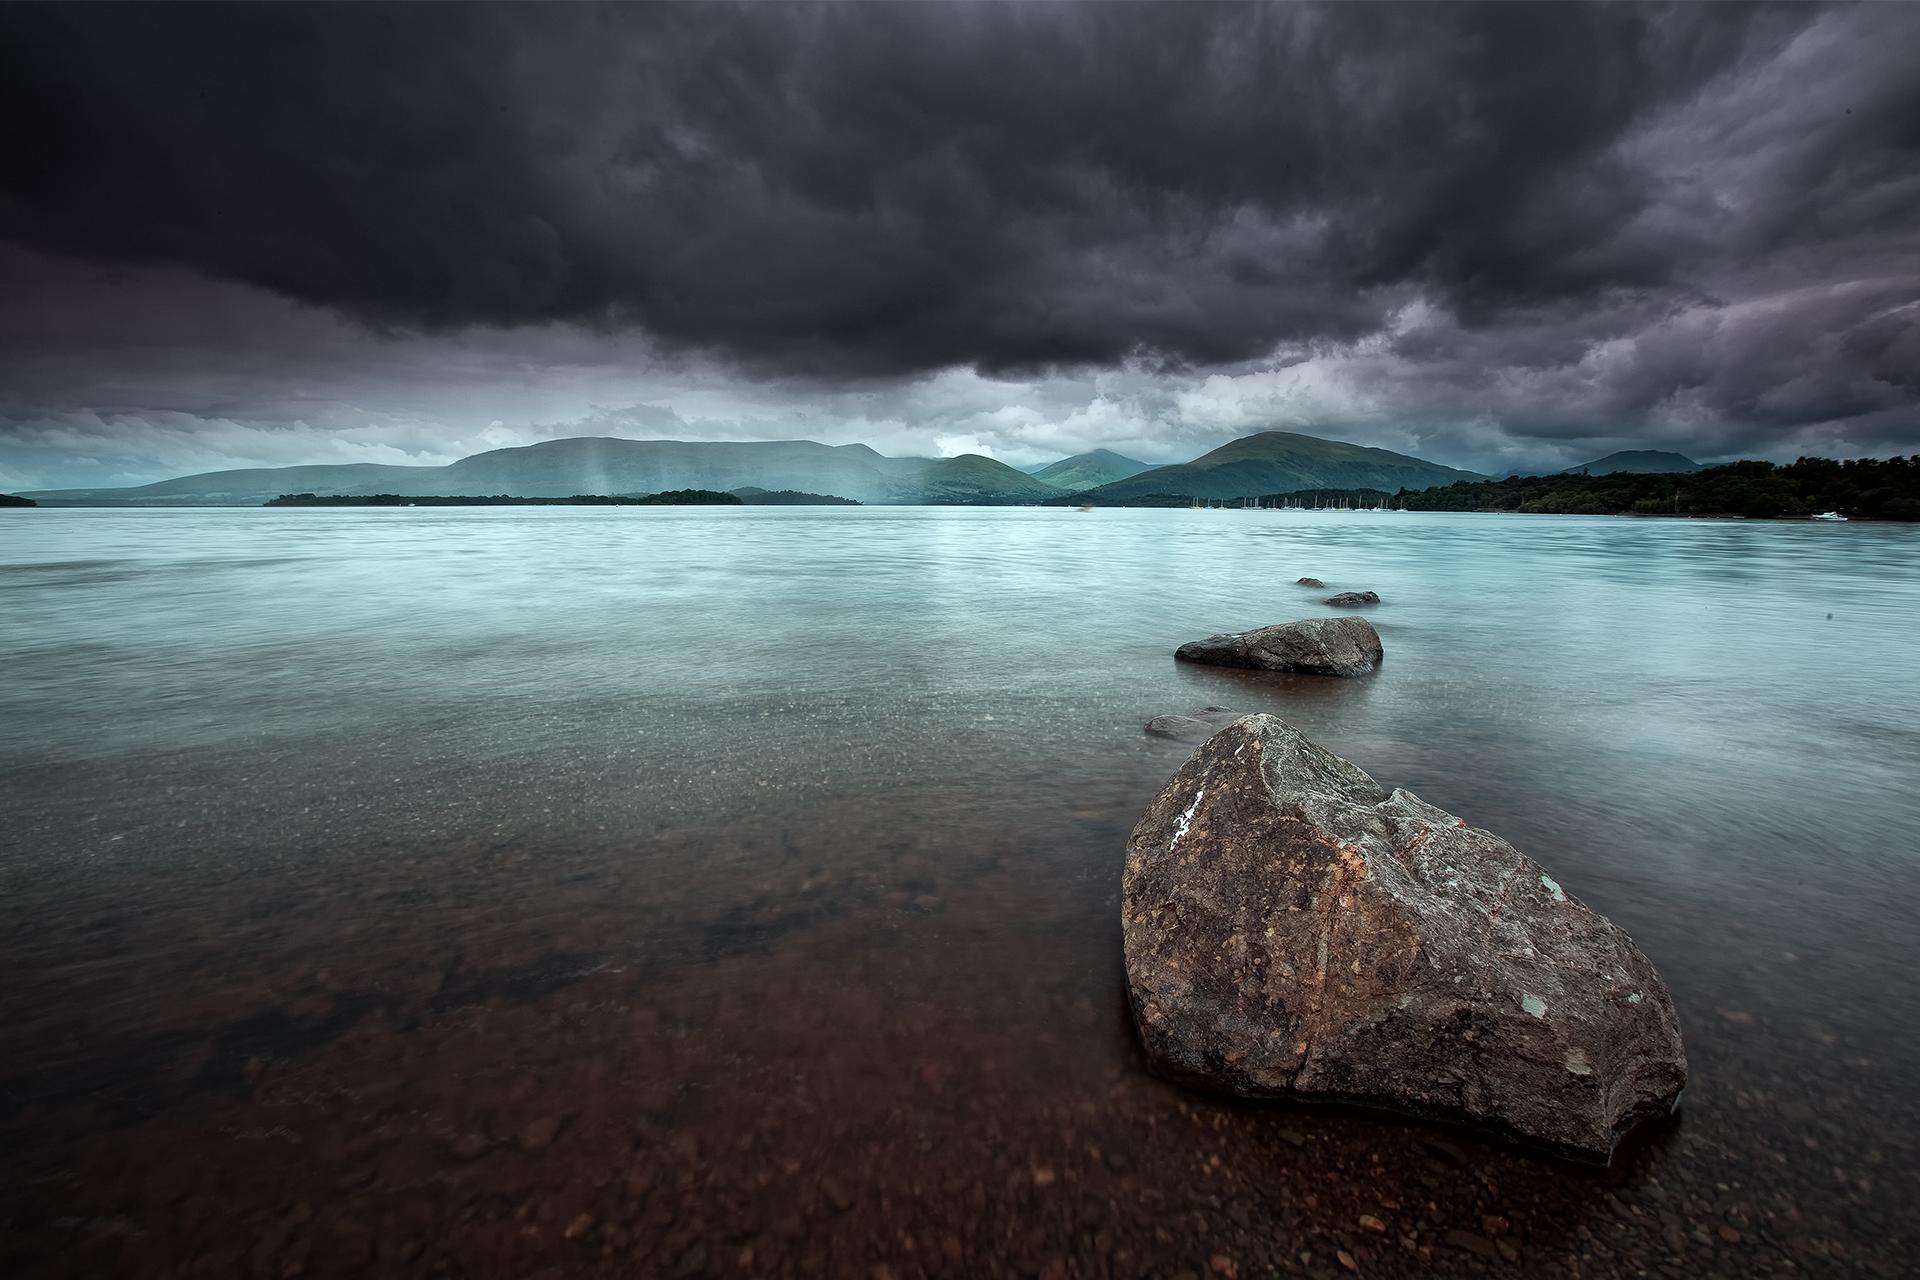 VAUDE-Visions-Wallpapers-for-free-Daniel-Kreher-Scotland-Loch-Lomond-wallpaper-wp48011704